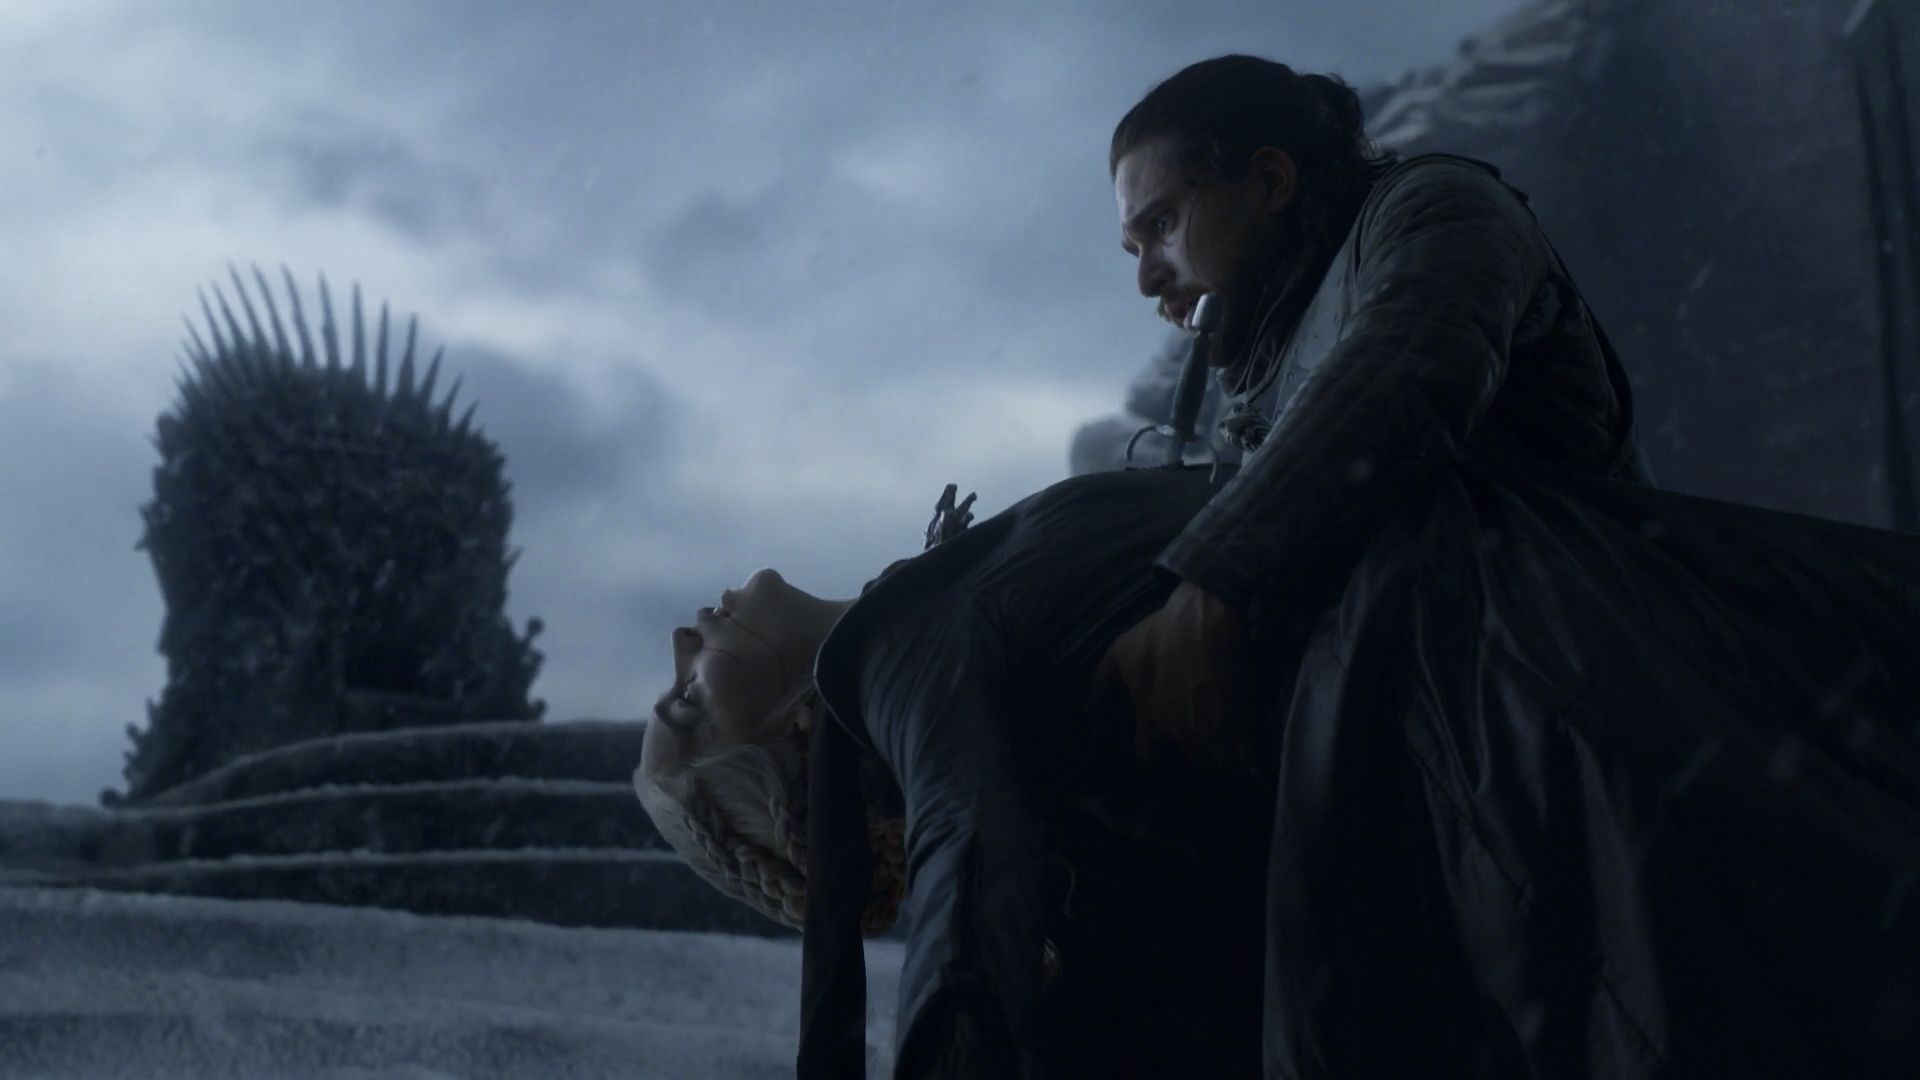 'Juego de Tronos' Aviso Muerte Daenerys Temporada 5 - Teoria Fan